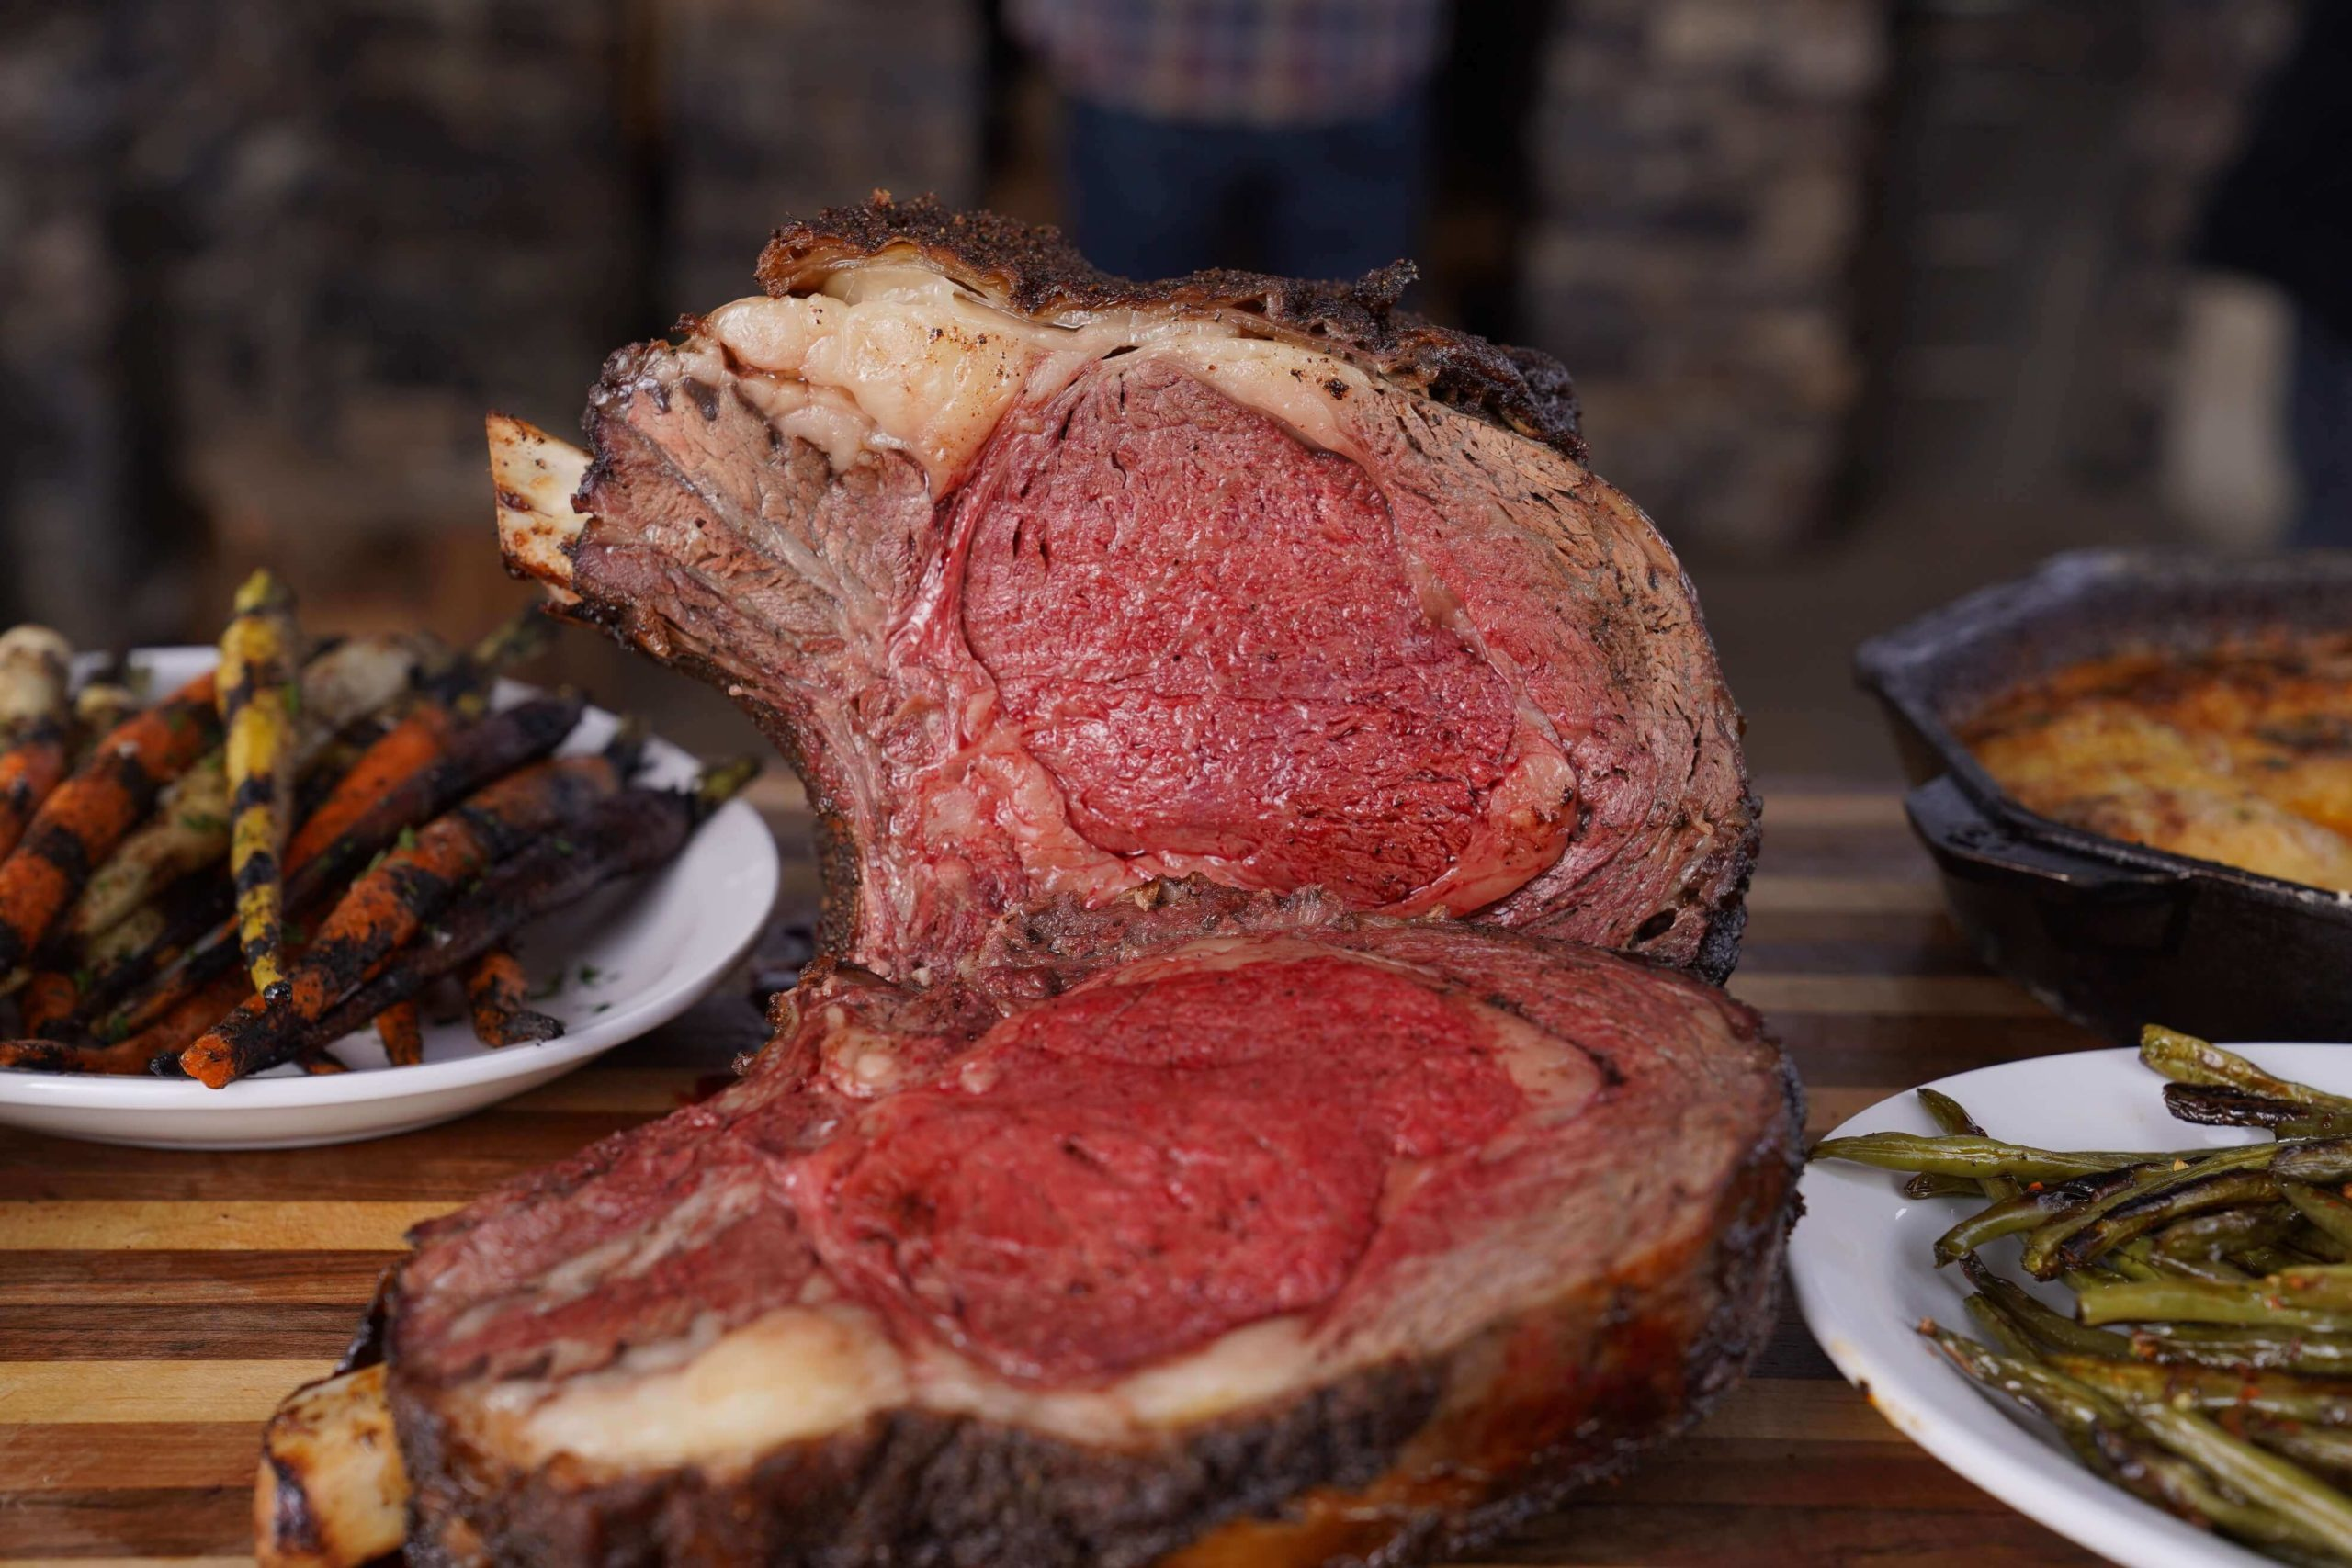 The Grill Dads' Roast Beast recipe